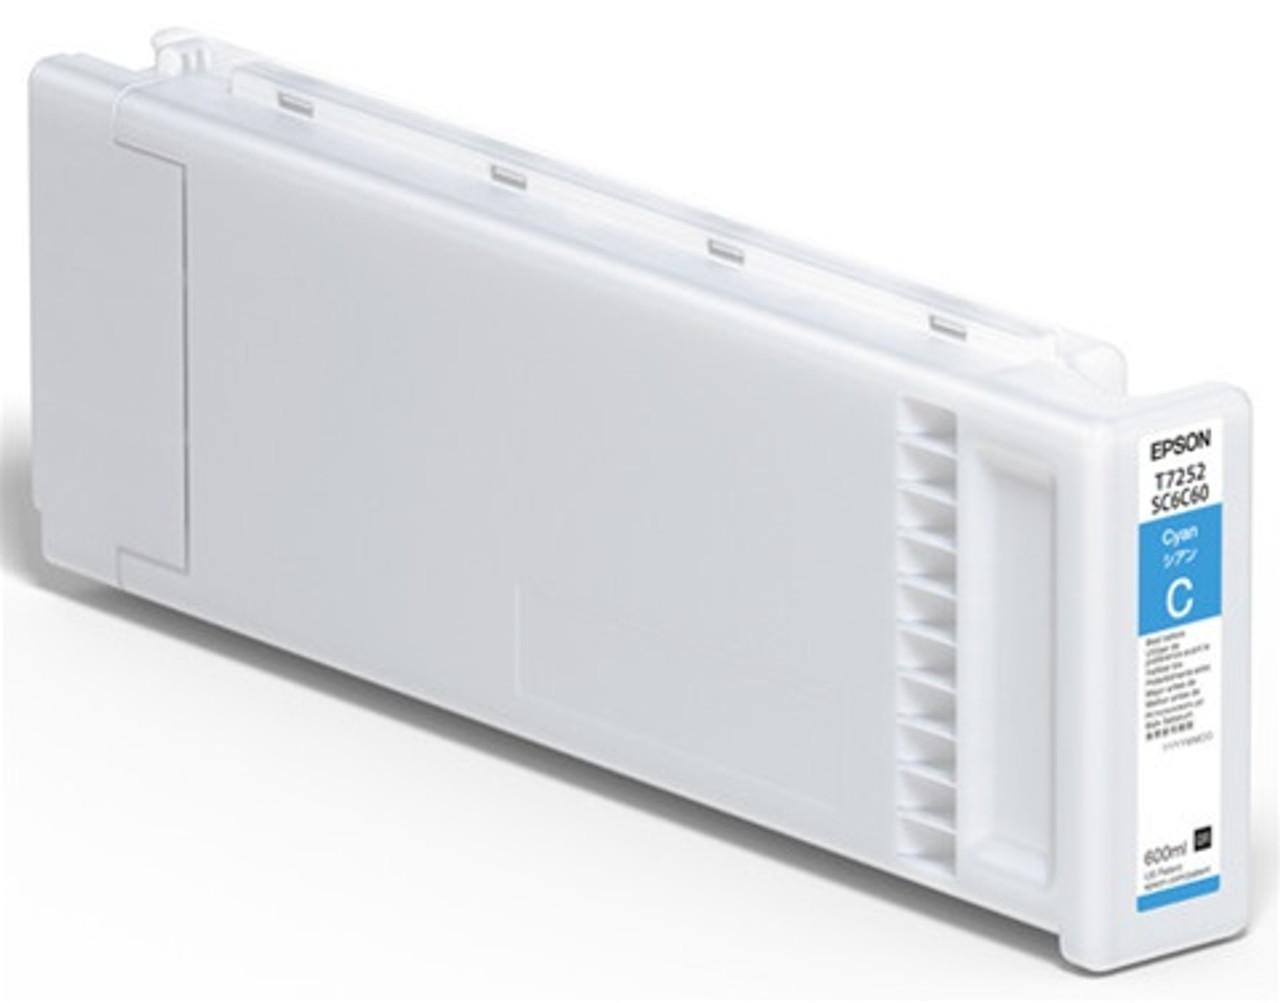 Epson F2100/F2000 Ink Cartridge, CYAN 600ML